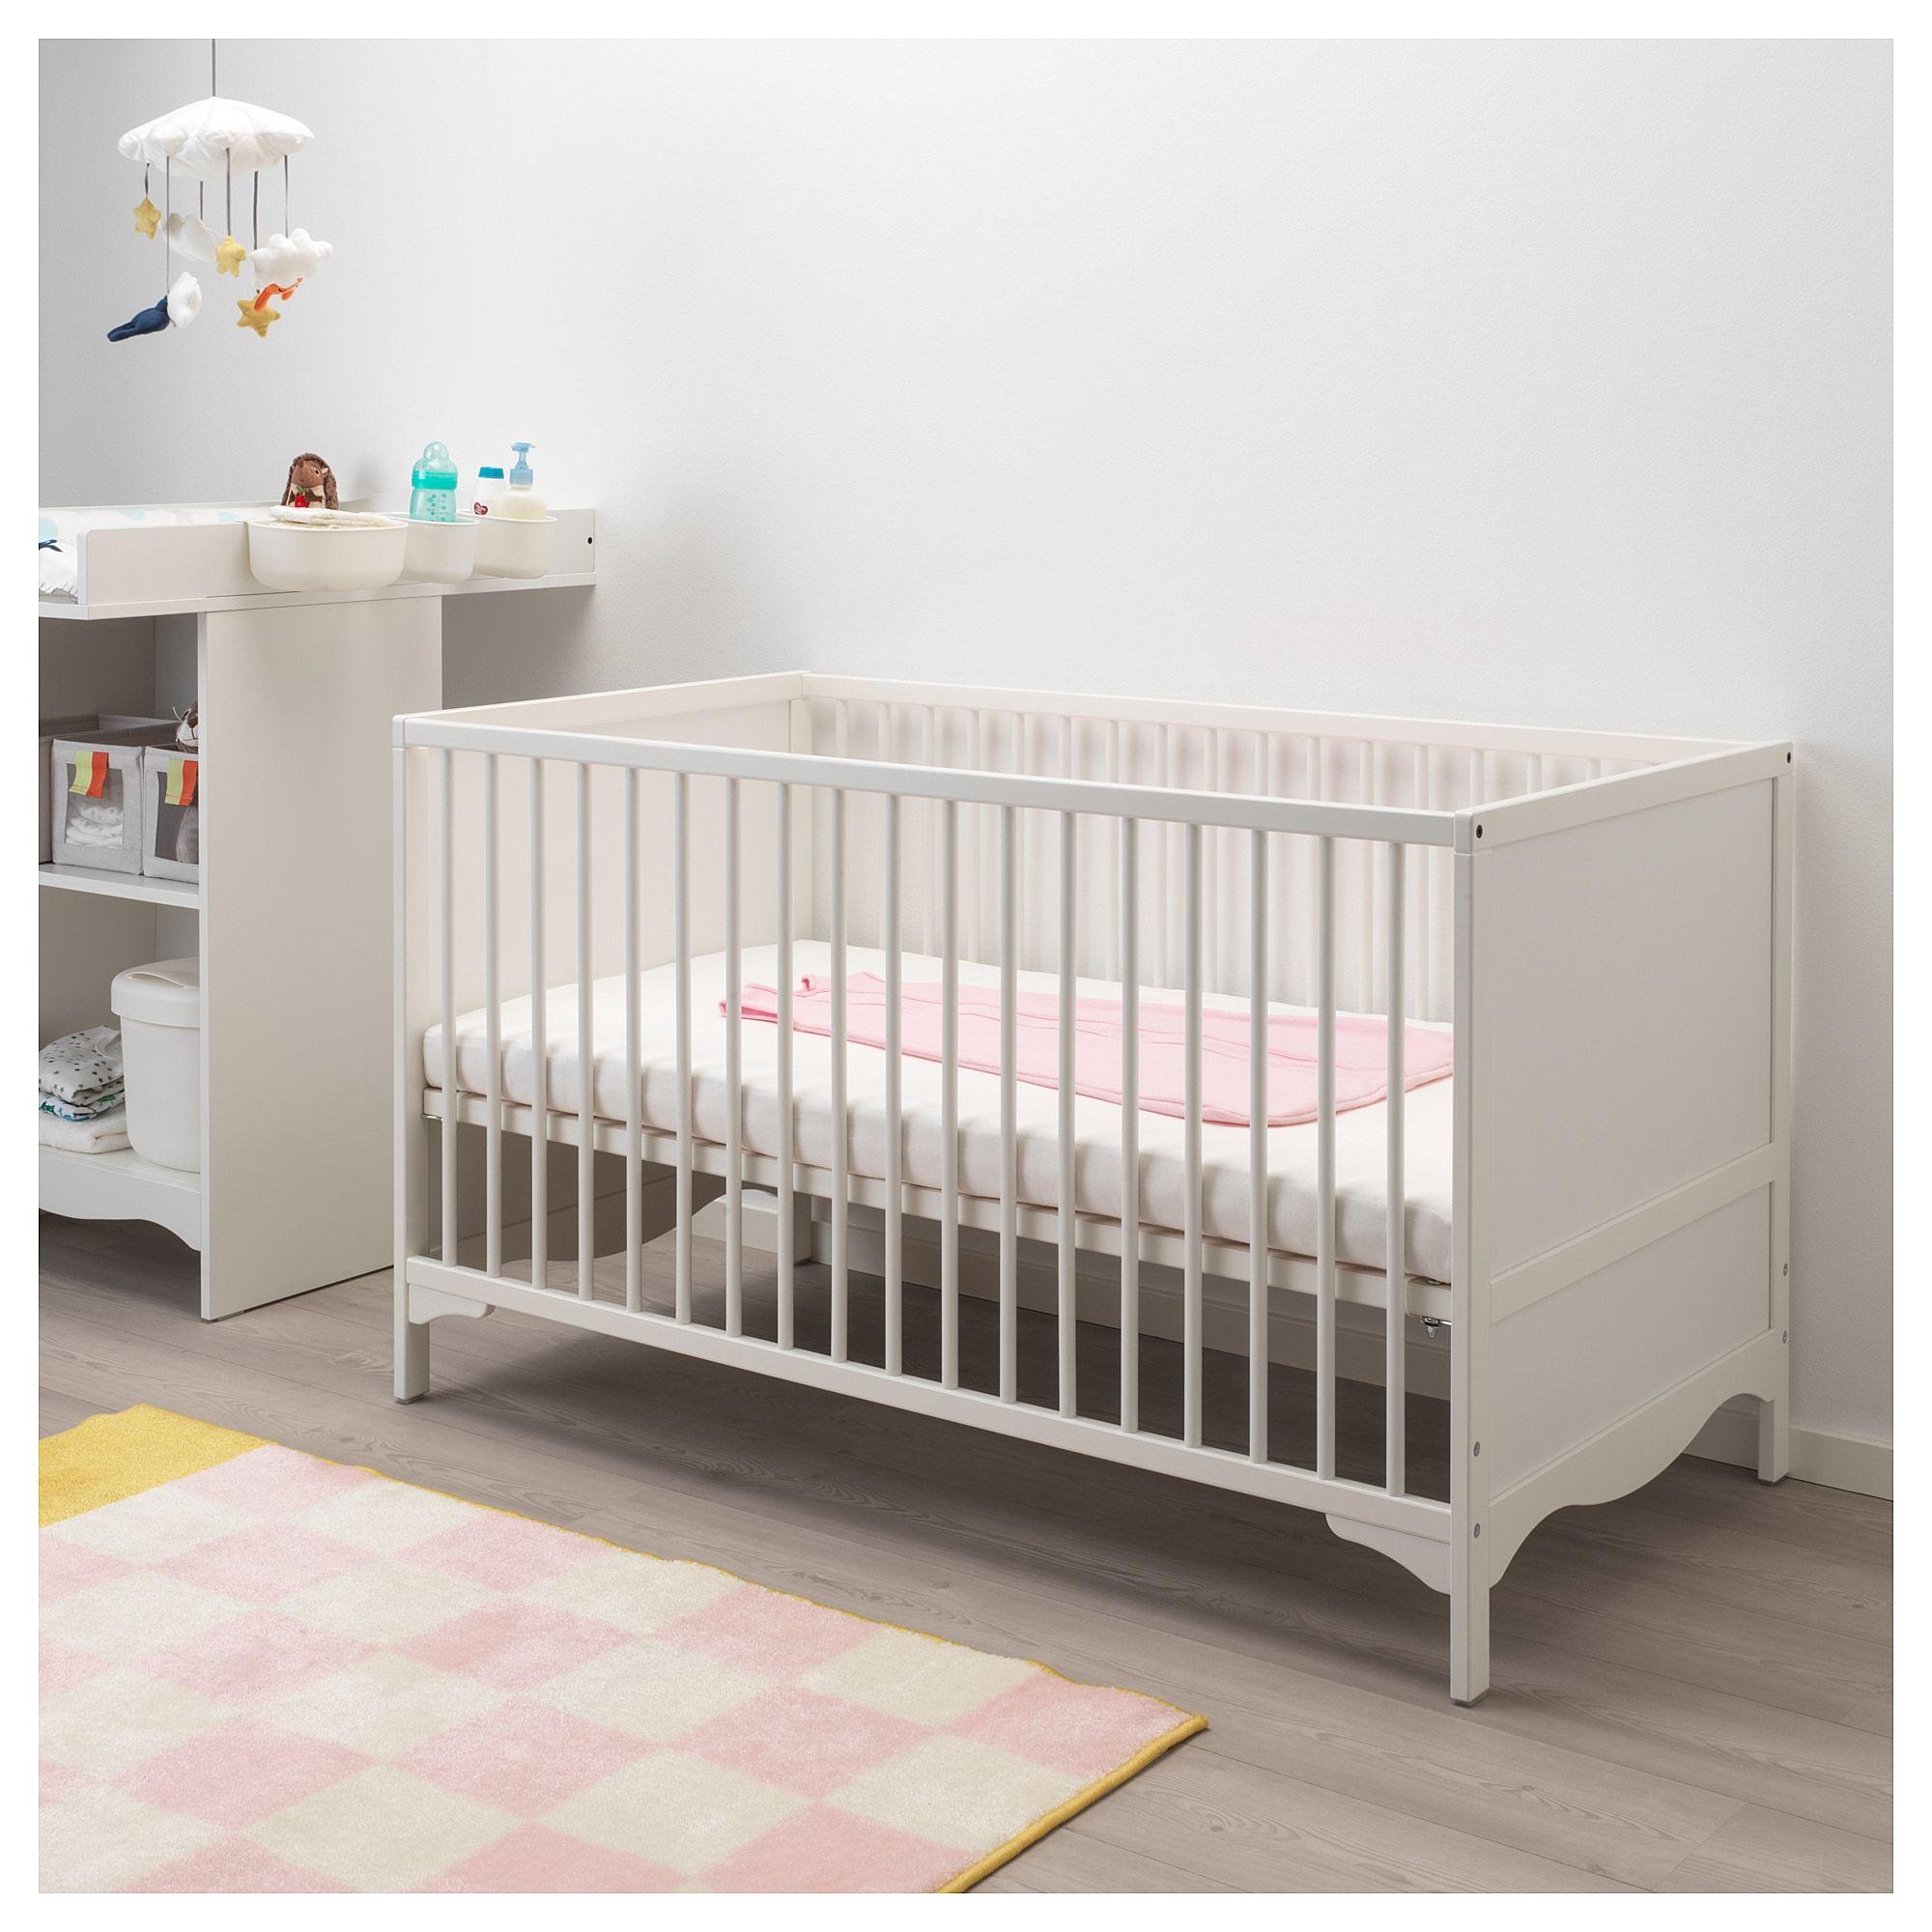 IKEA SOLGUL Crib white Cribs, Ikea cot, Ikea toddler bed